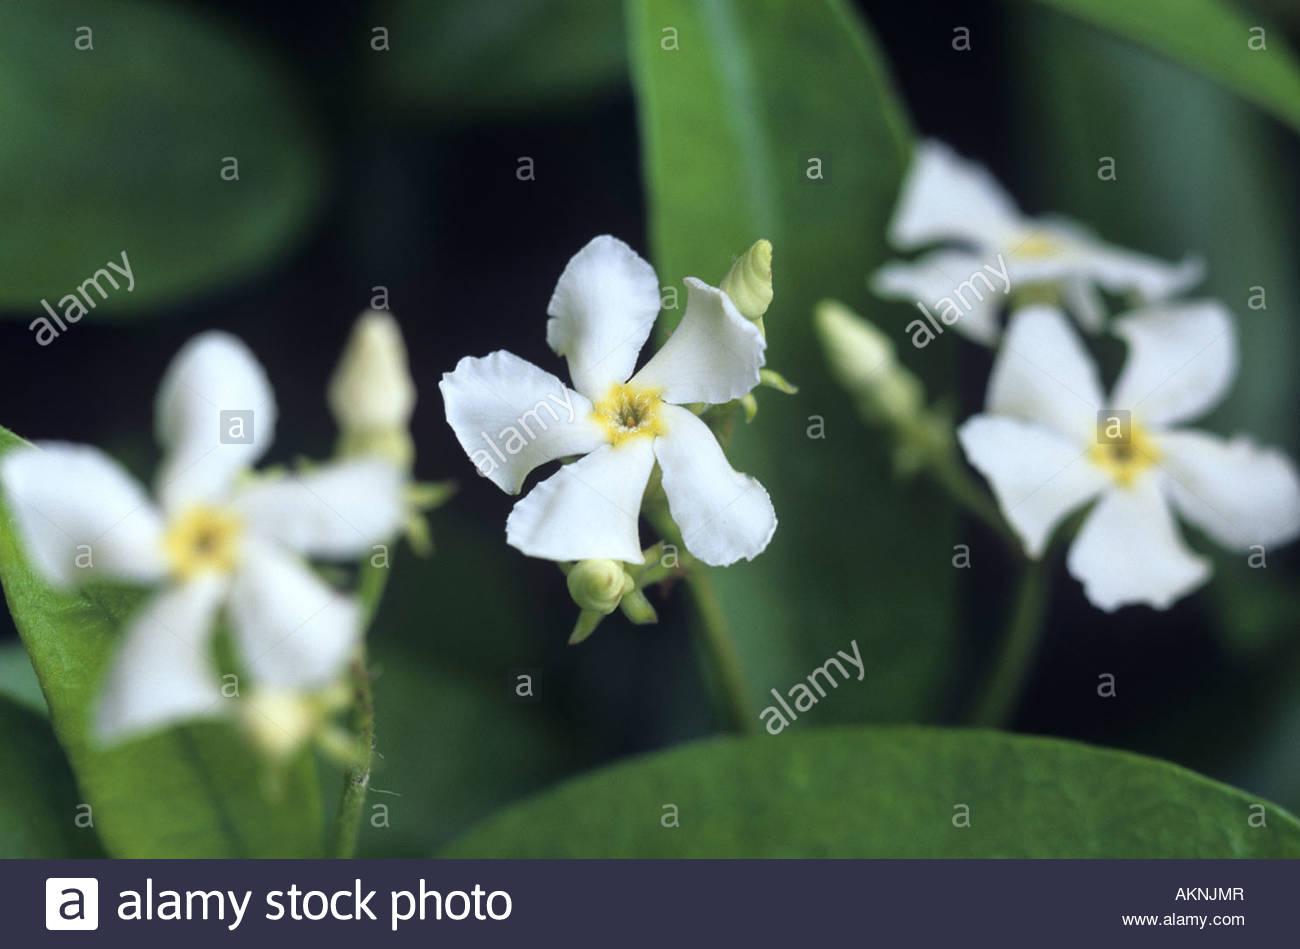 Trachelospermum jasminoides star jasmine small scented white flowers trachelospermum jasminoides star jasmine small scented white flowers with evergreen foliage mightylinksfo